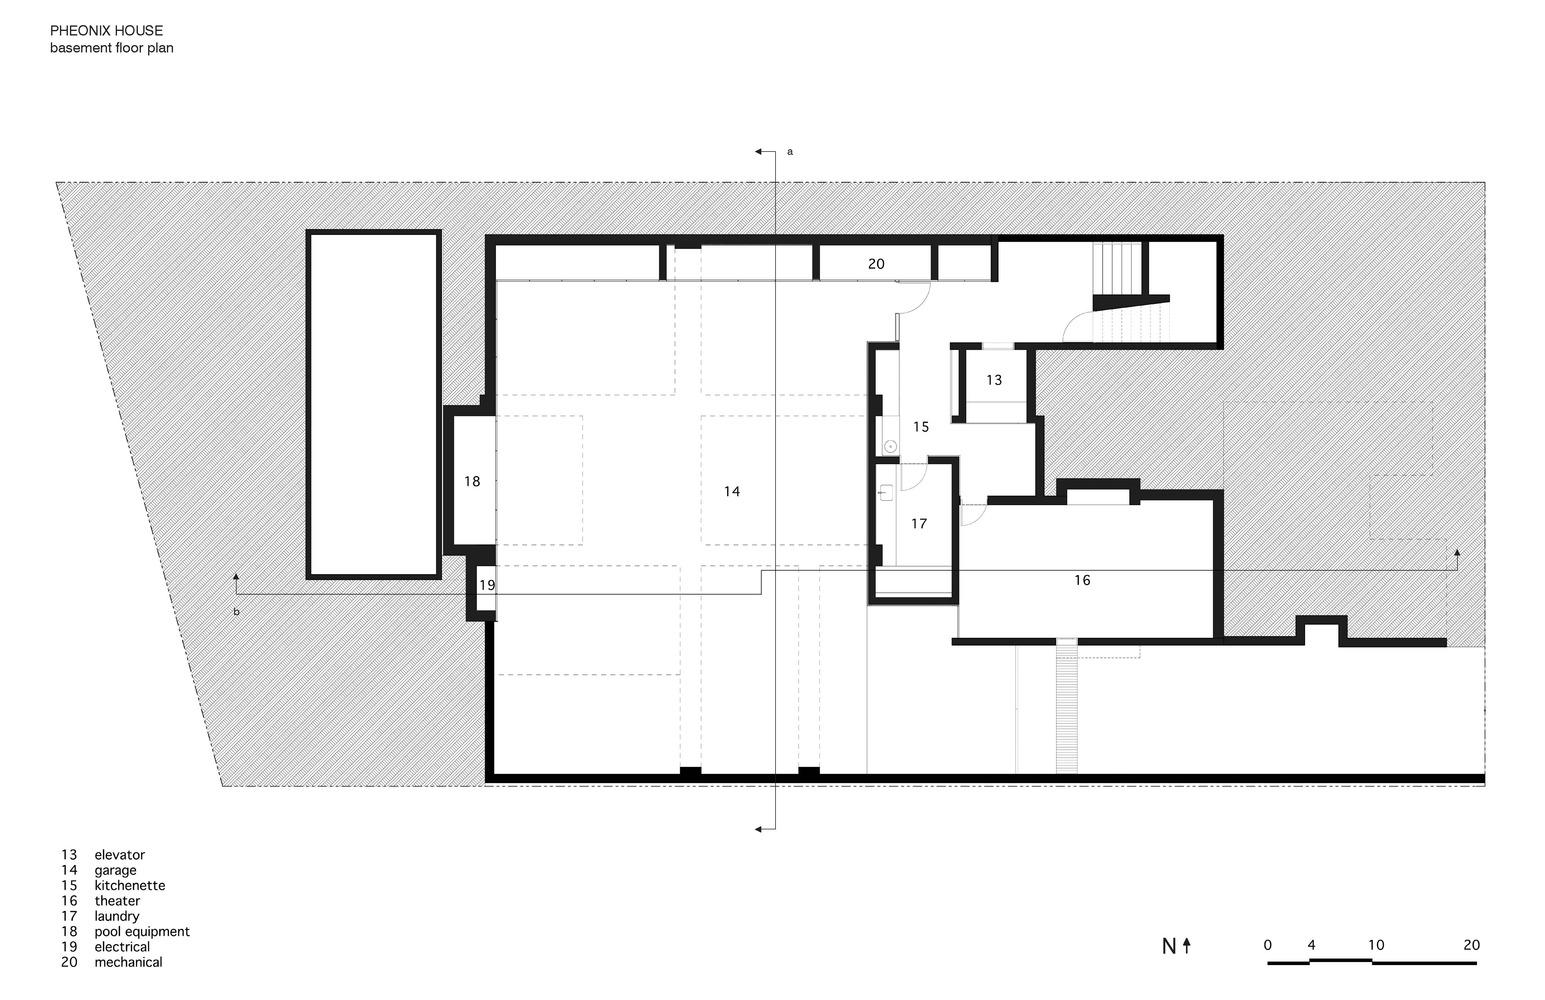 small resolution of phoenix house sebastian mariscal studio basement plan